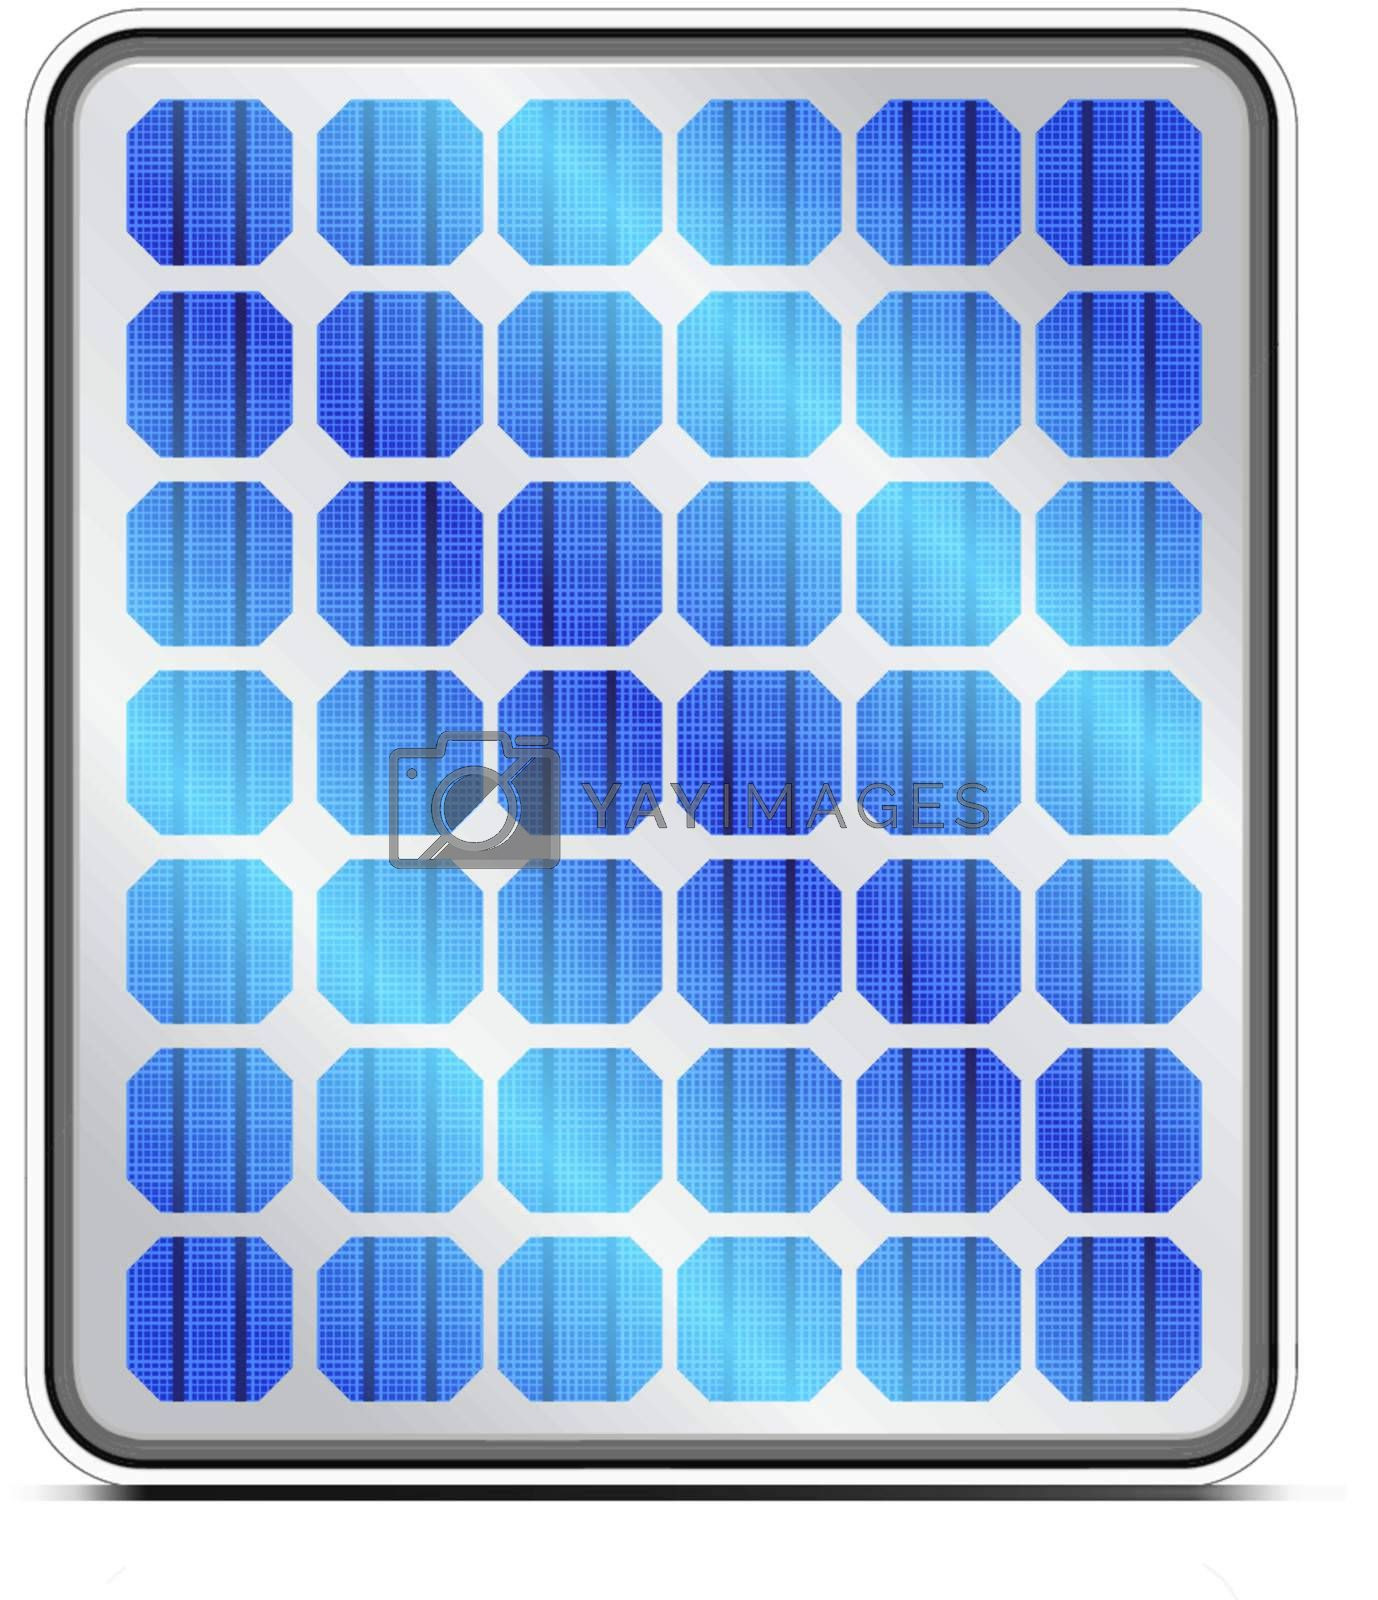 Reflection in solar panels. Vector illustration on white